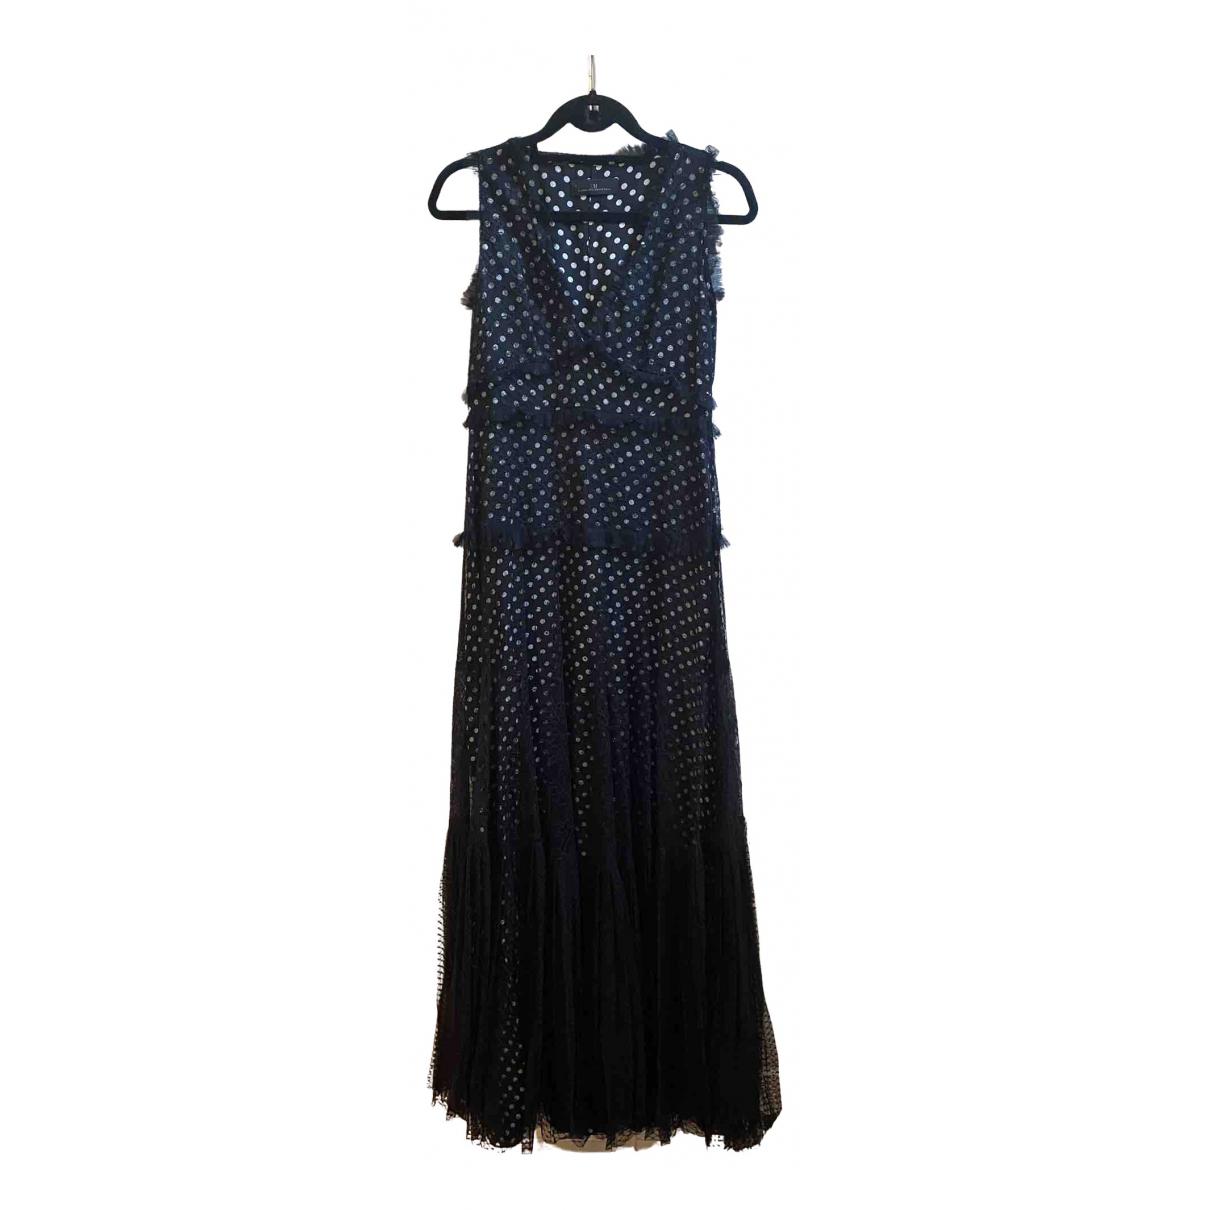 Carolina Herrera \N Kleid in  Schwarz Spitze